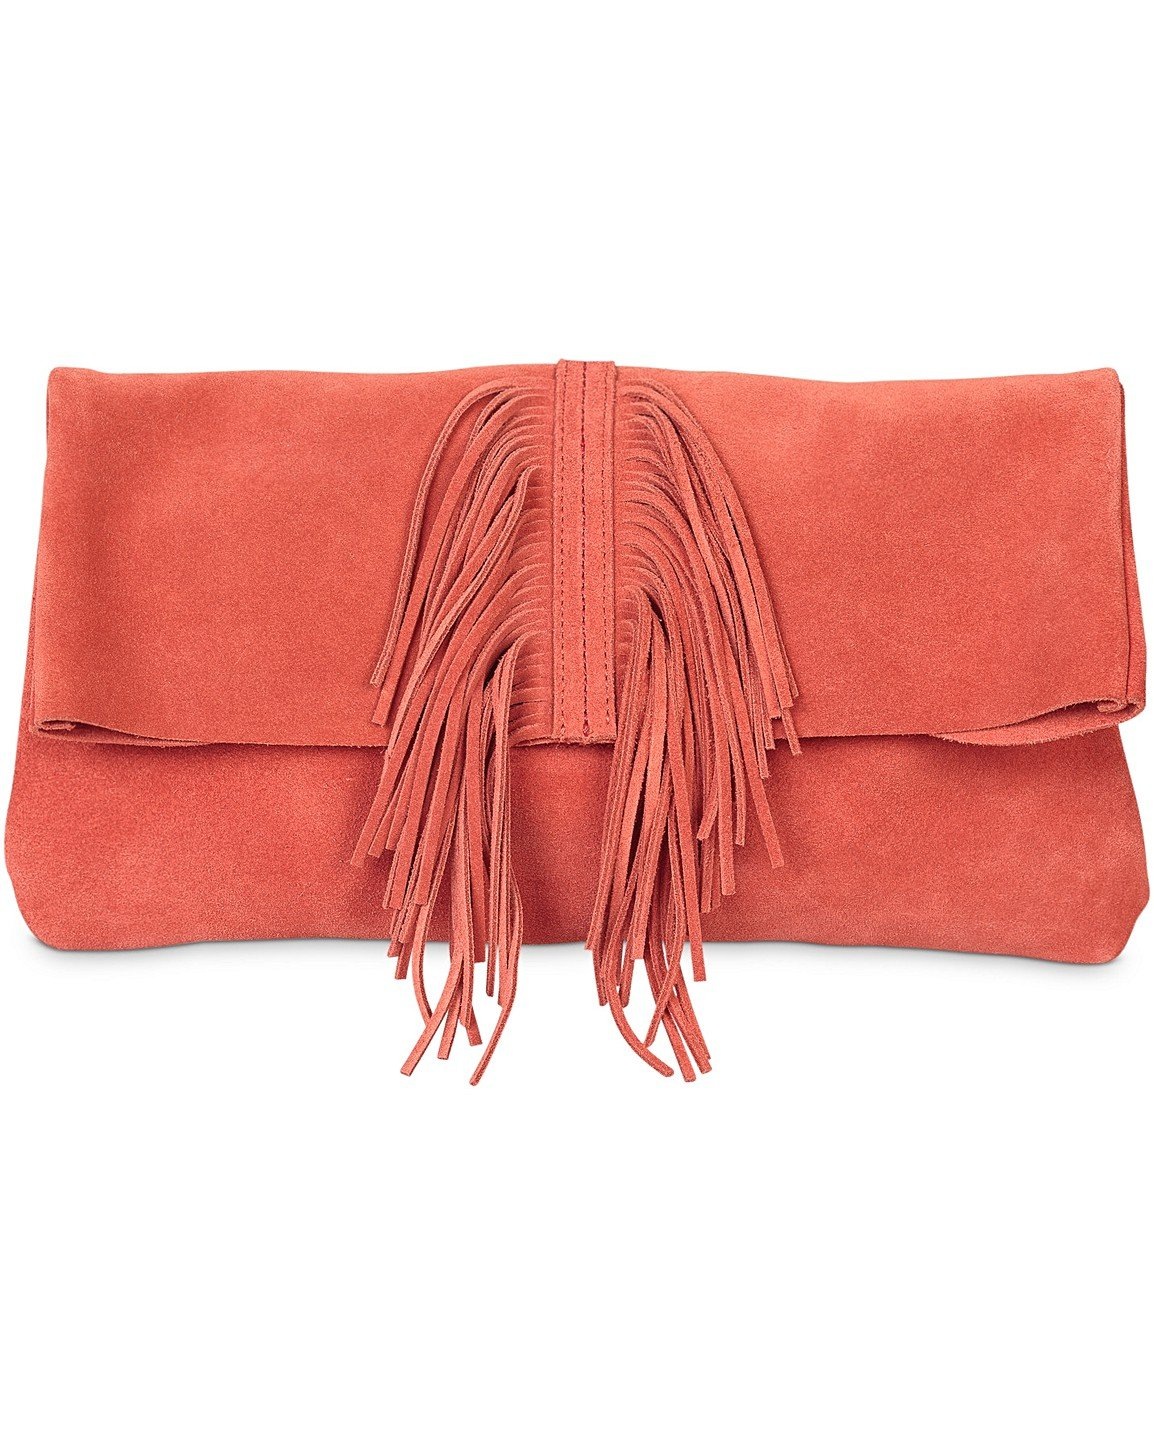 8aa25cd0a0a49 Orange Tassel Front Suede Clutch Bag